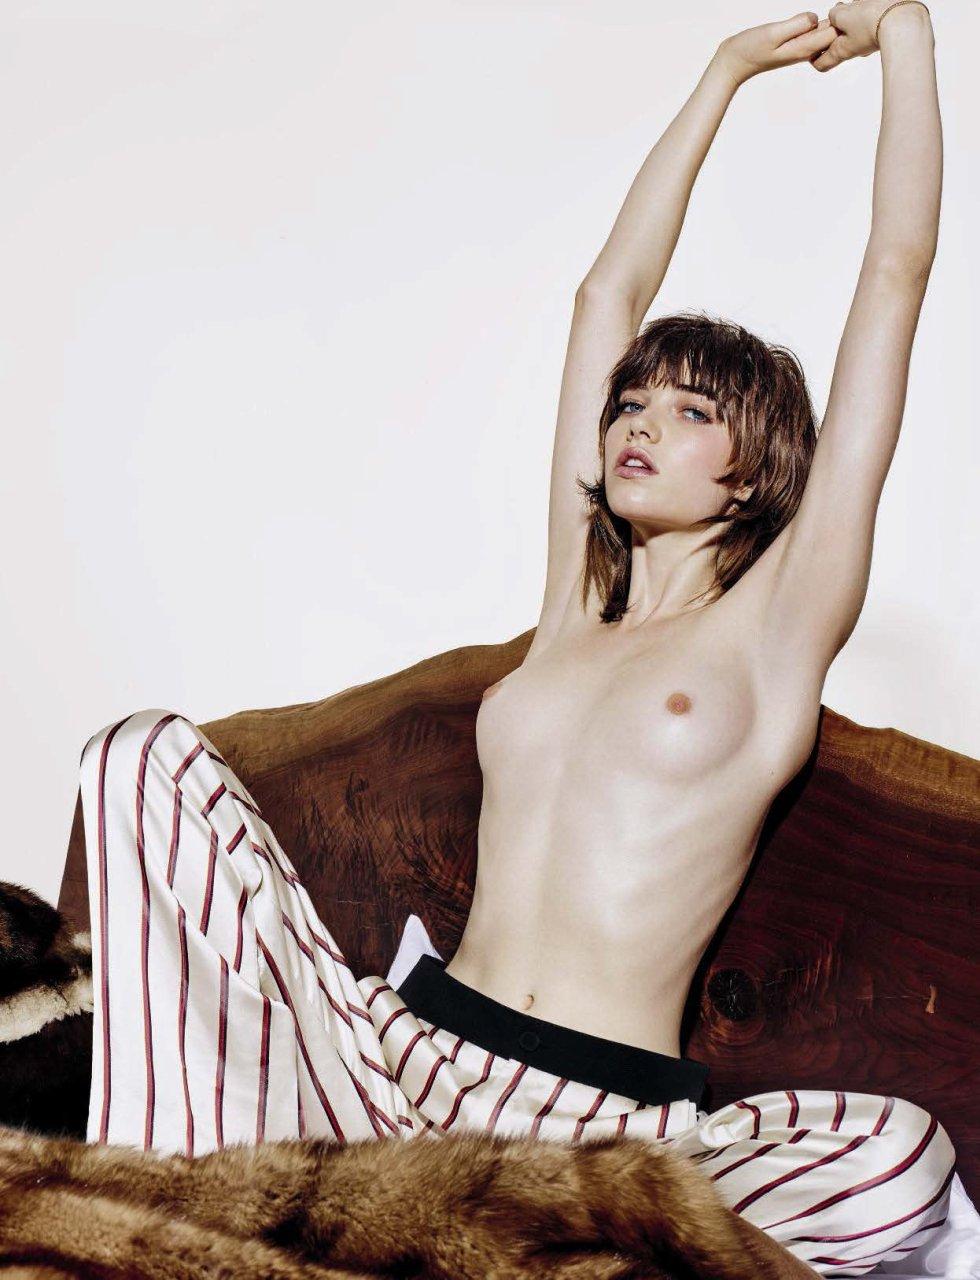 nude (57 photo), Fappening Celebrity image